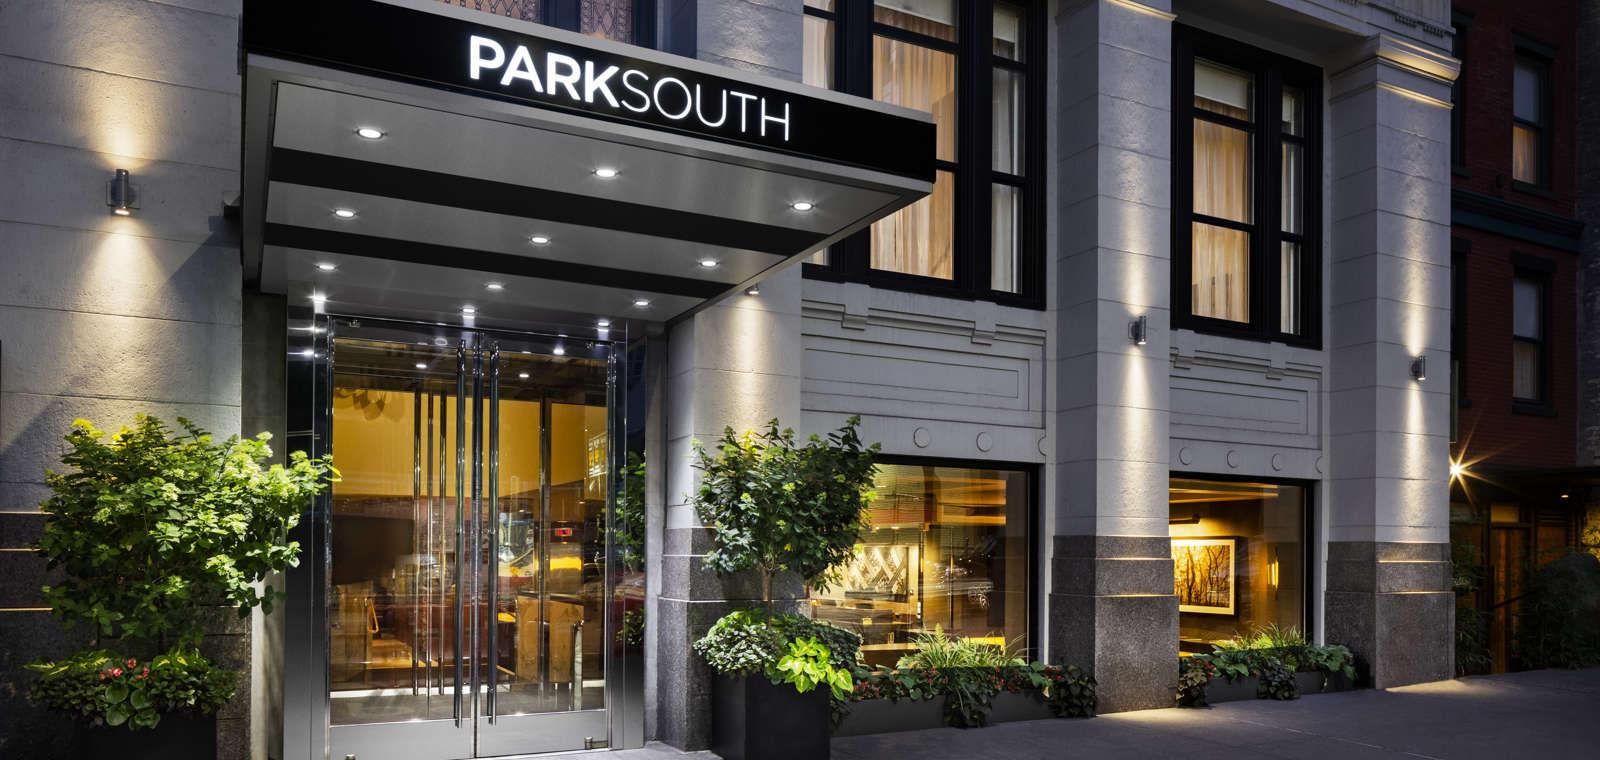 Park South Hotel Front Entrance